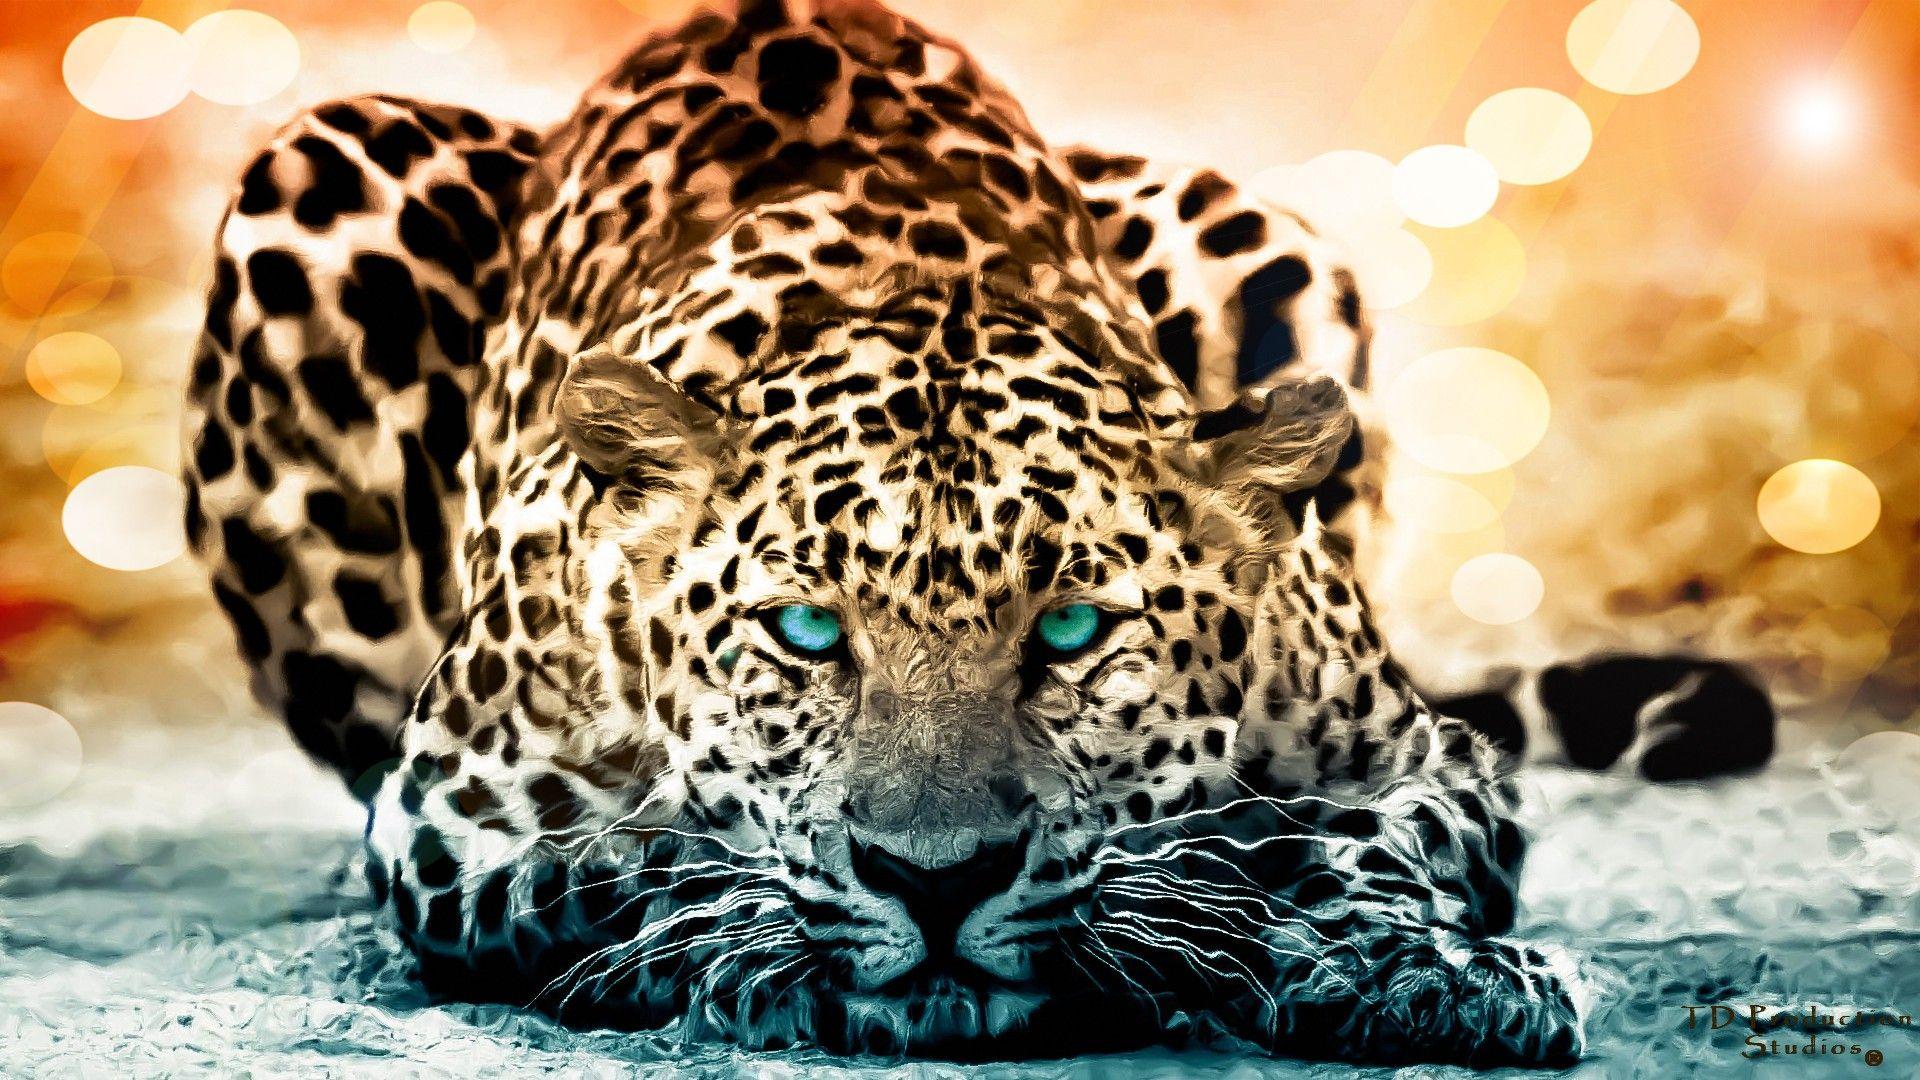 171 jaguar hd wallpapers | backgrounds - wallpaper abyss | cats